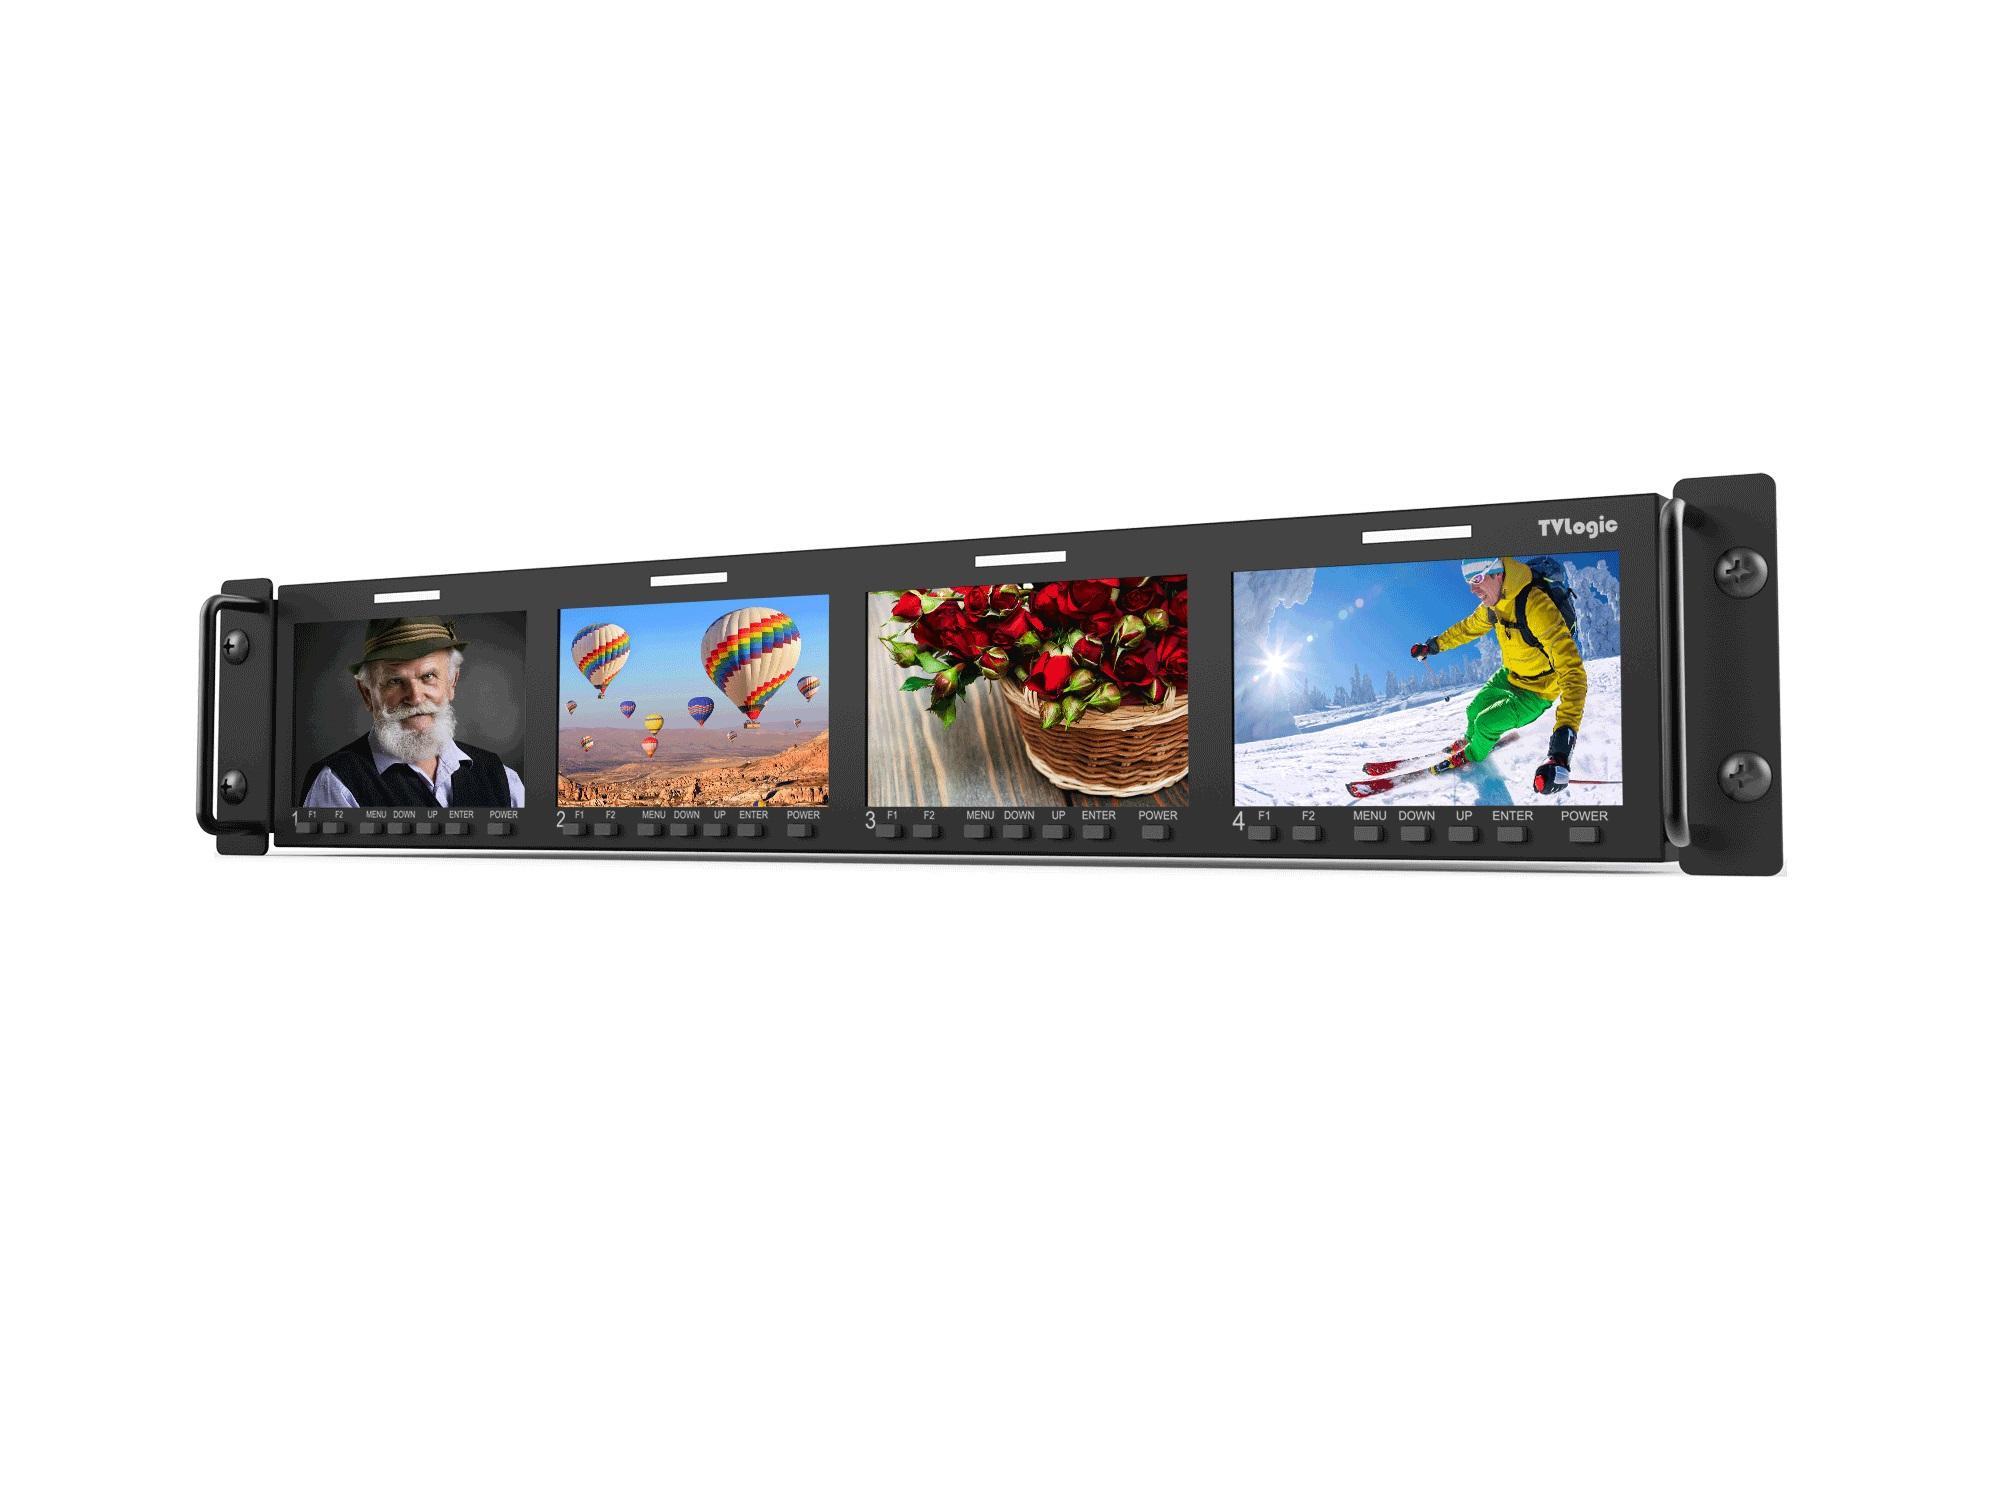 TVlogic RKM-443A Quad 4.3 inch 800x480 HD/SD Multi-Channel LCD Rack Monitor